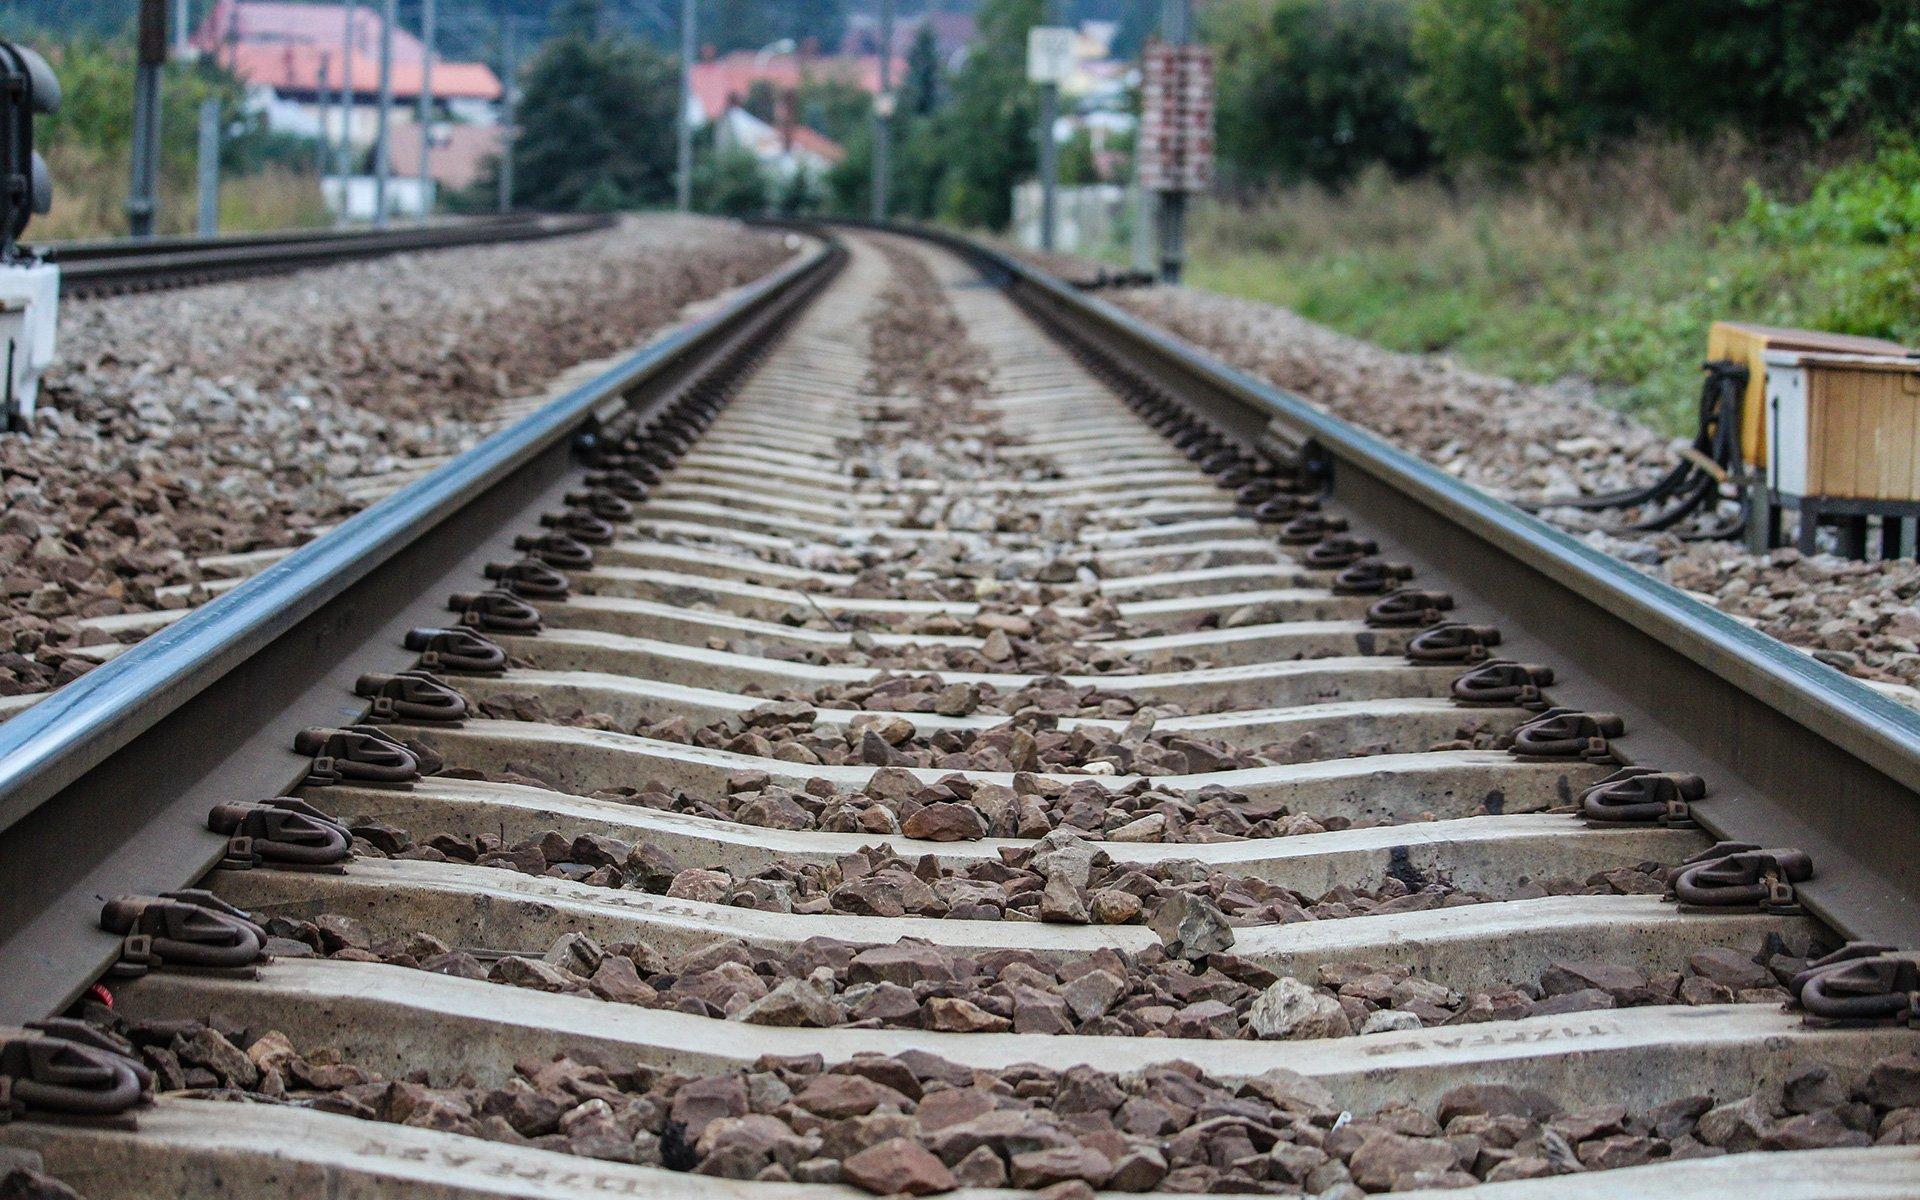 train tracks on the ground